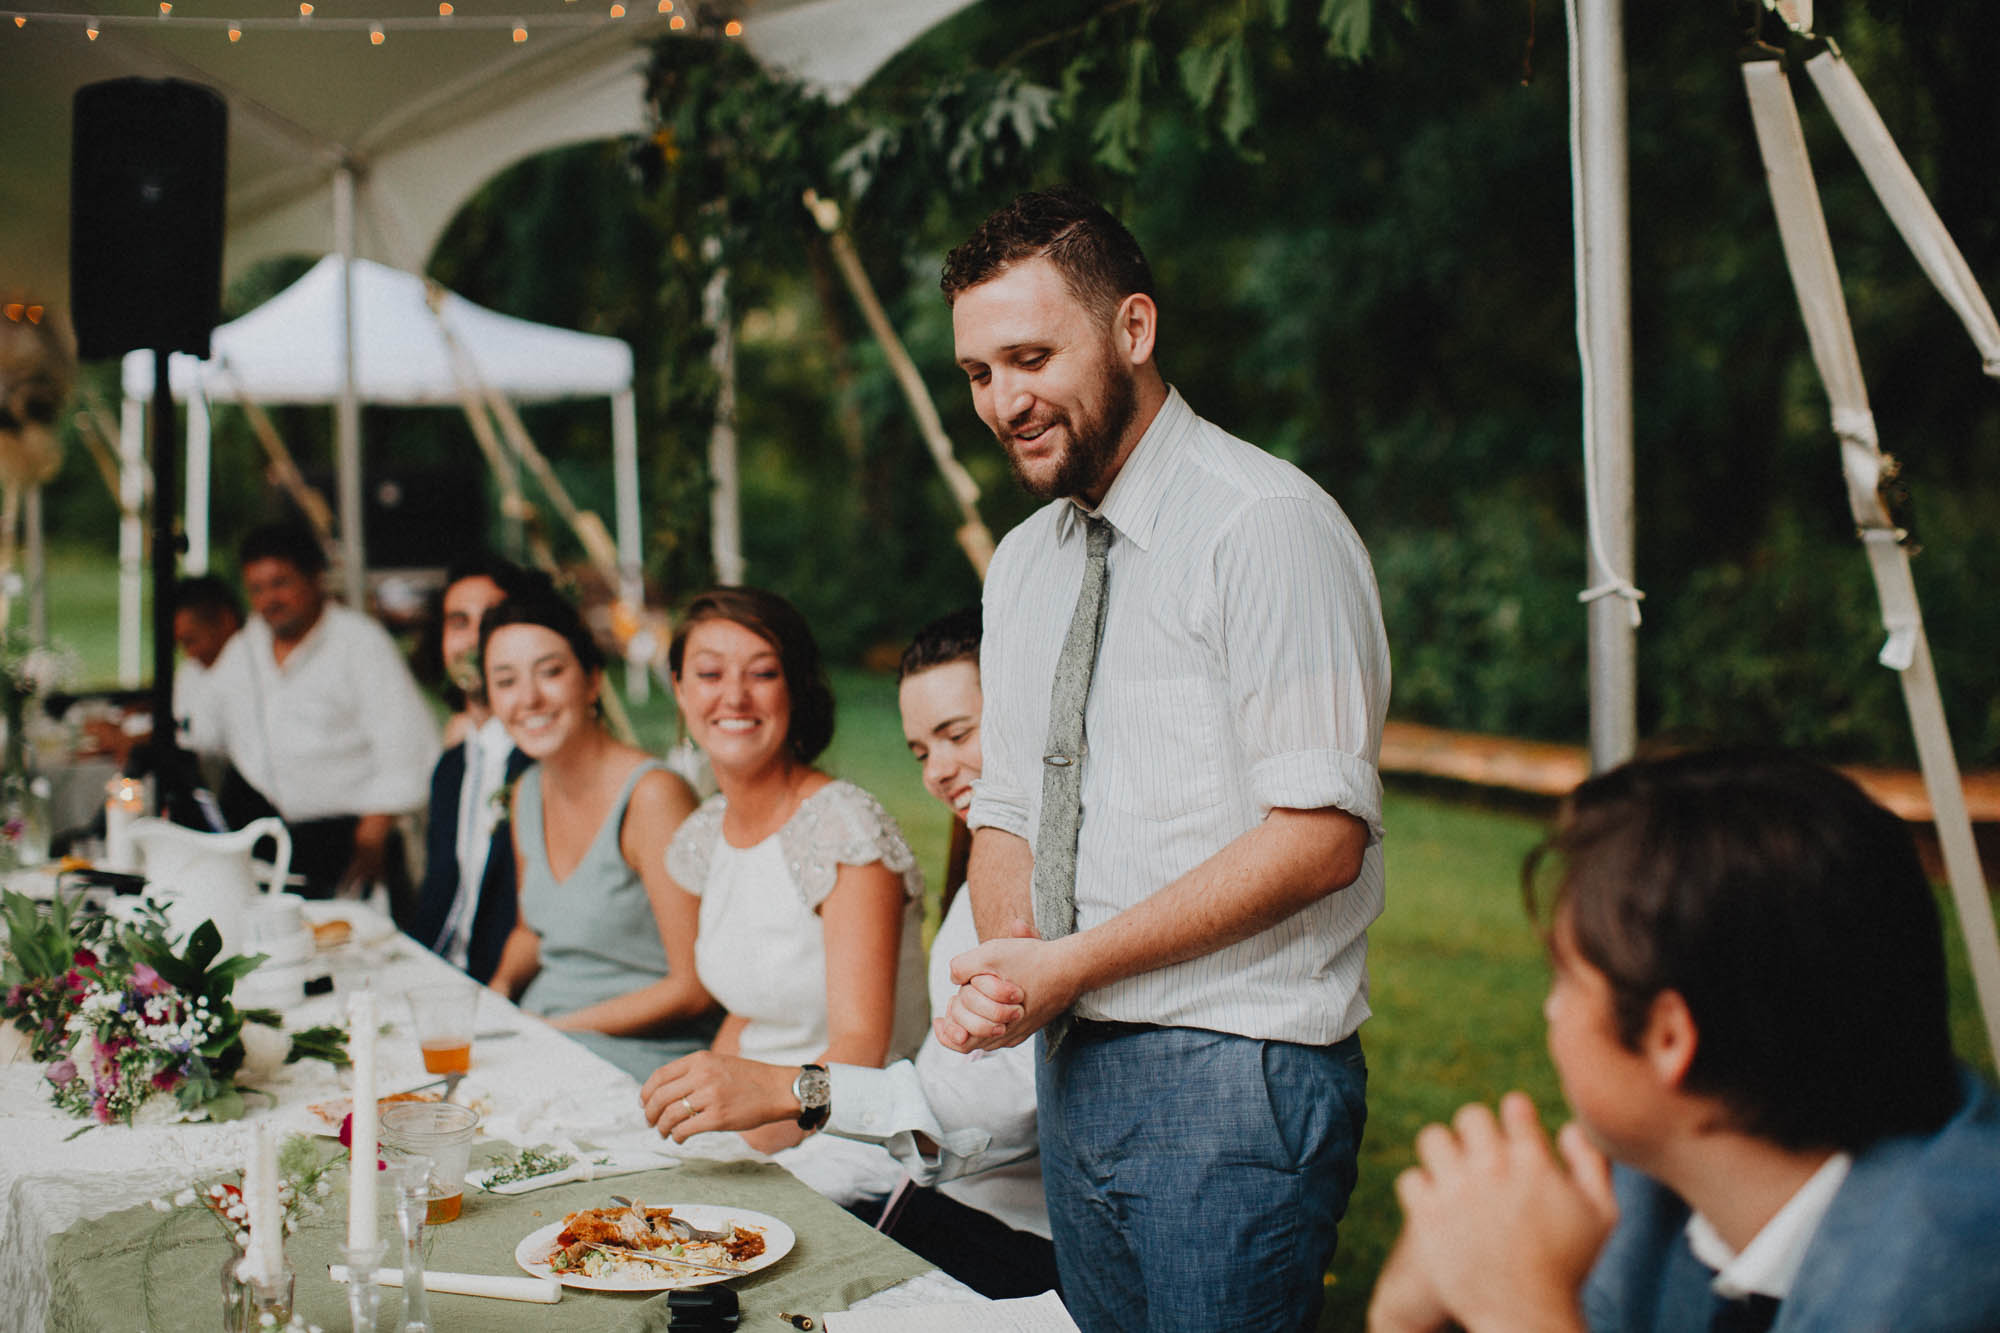 Leah-Graham-Michigan-Outdoor-DIY-Wedding-063@2x.jpg